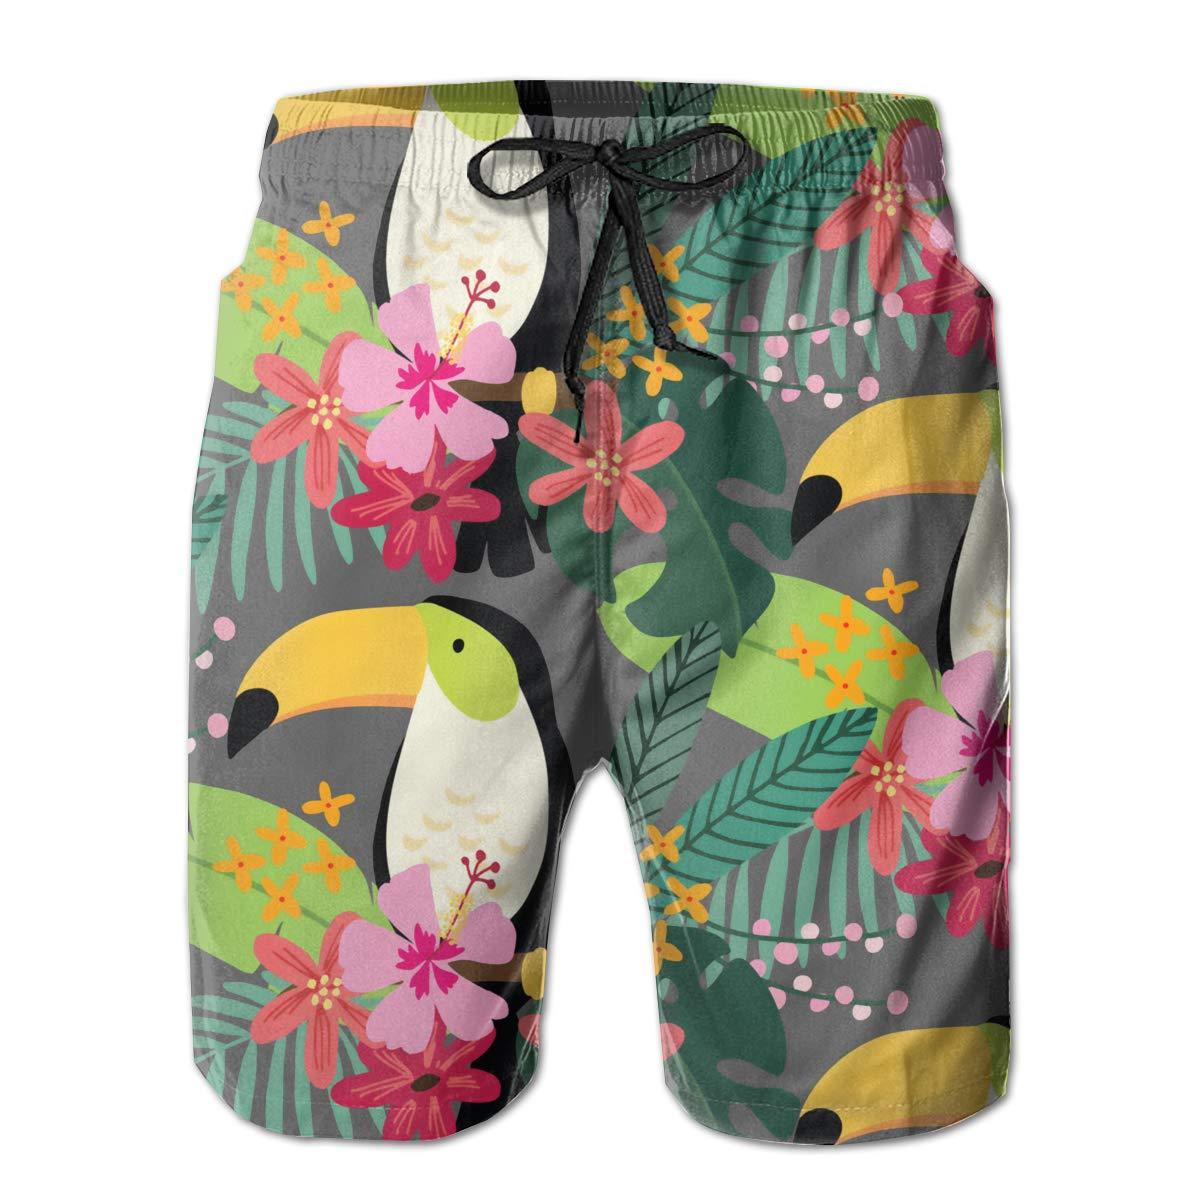 SARA NELL Mens Swim Trunks Tropical Jungle with Toucan Bird Surfing Beach Board Shorts Swimwear